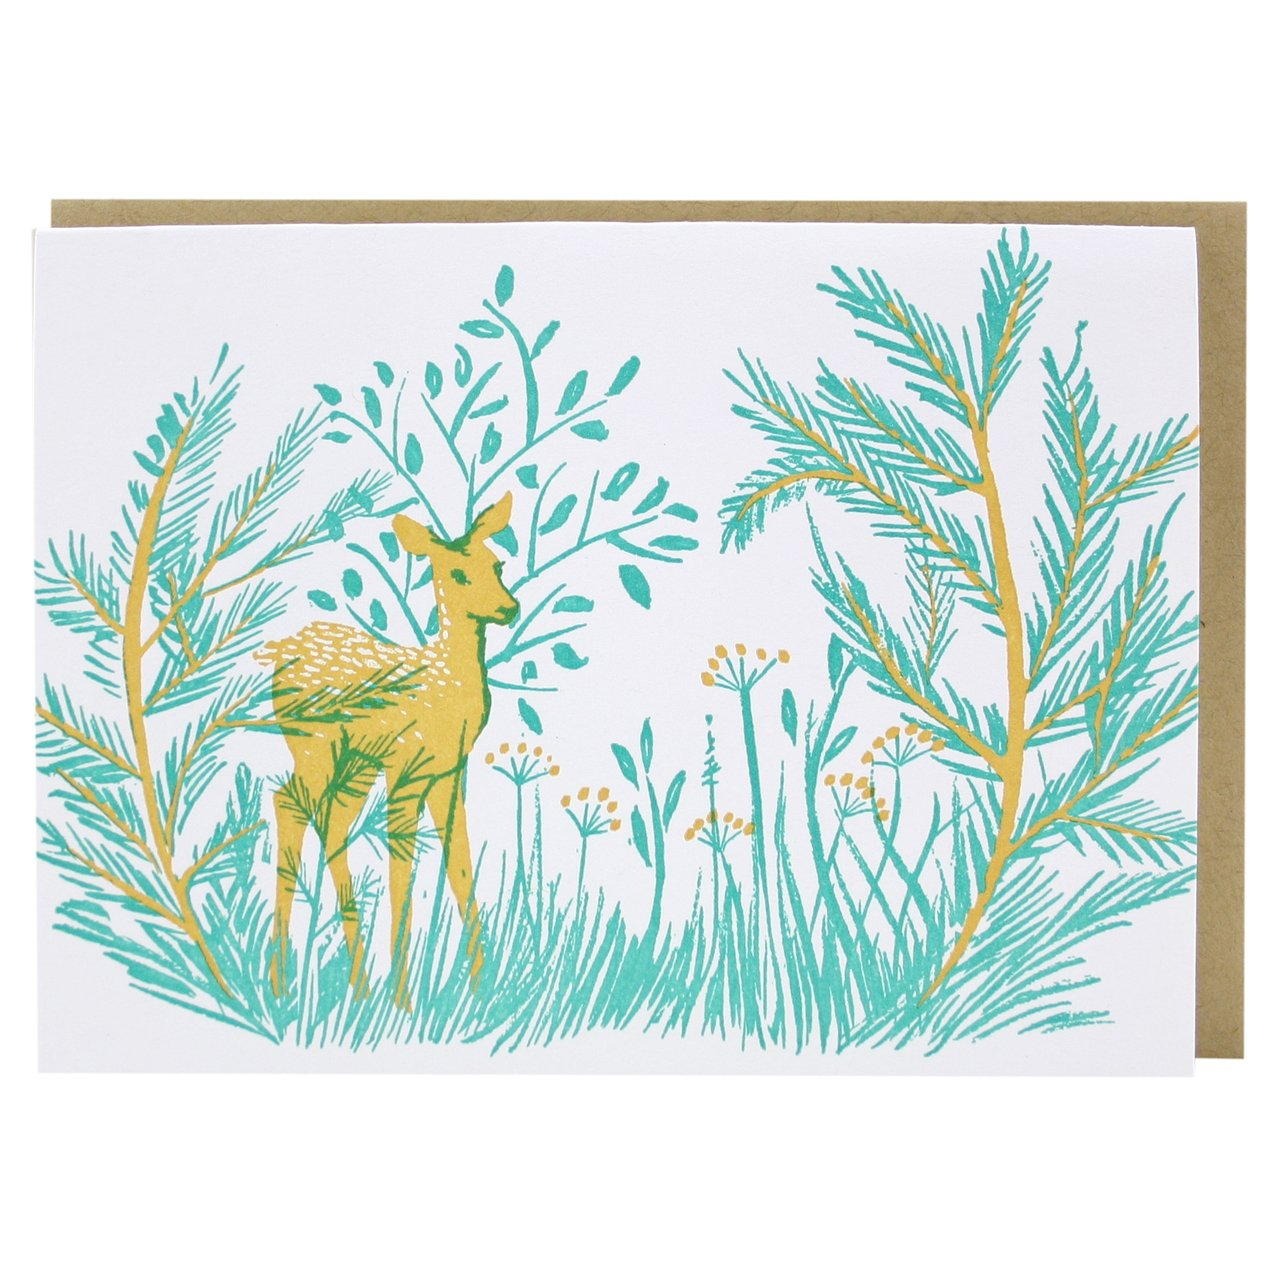 deer-in-forest-note-card_1280x1280.jpg